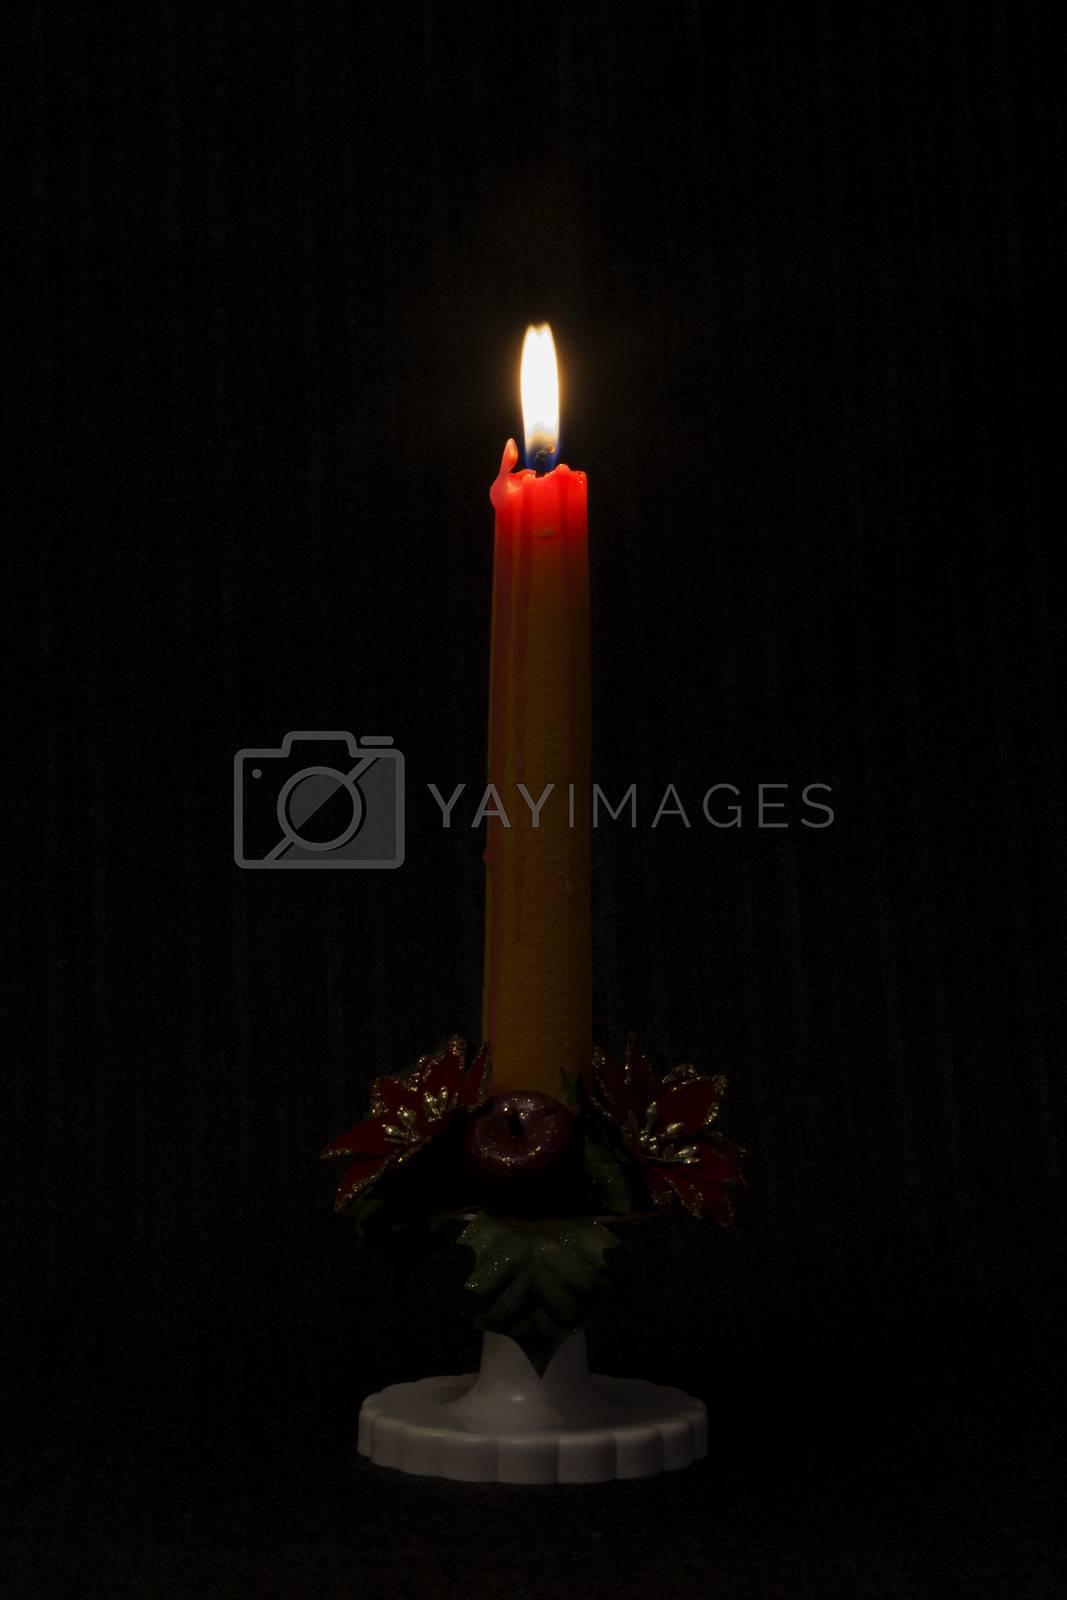 Lit candle on black background